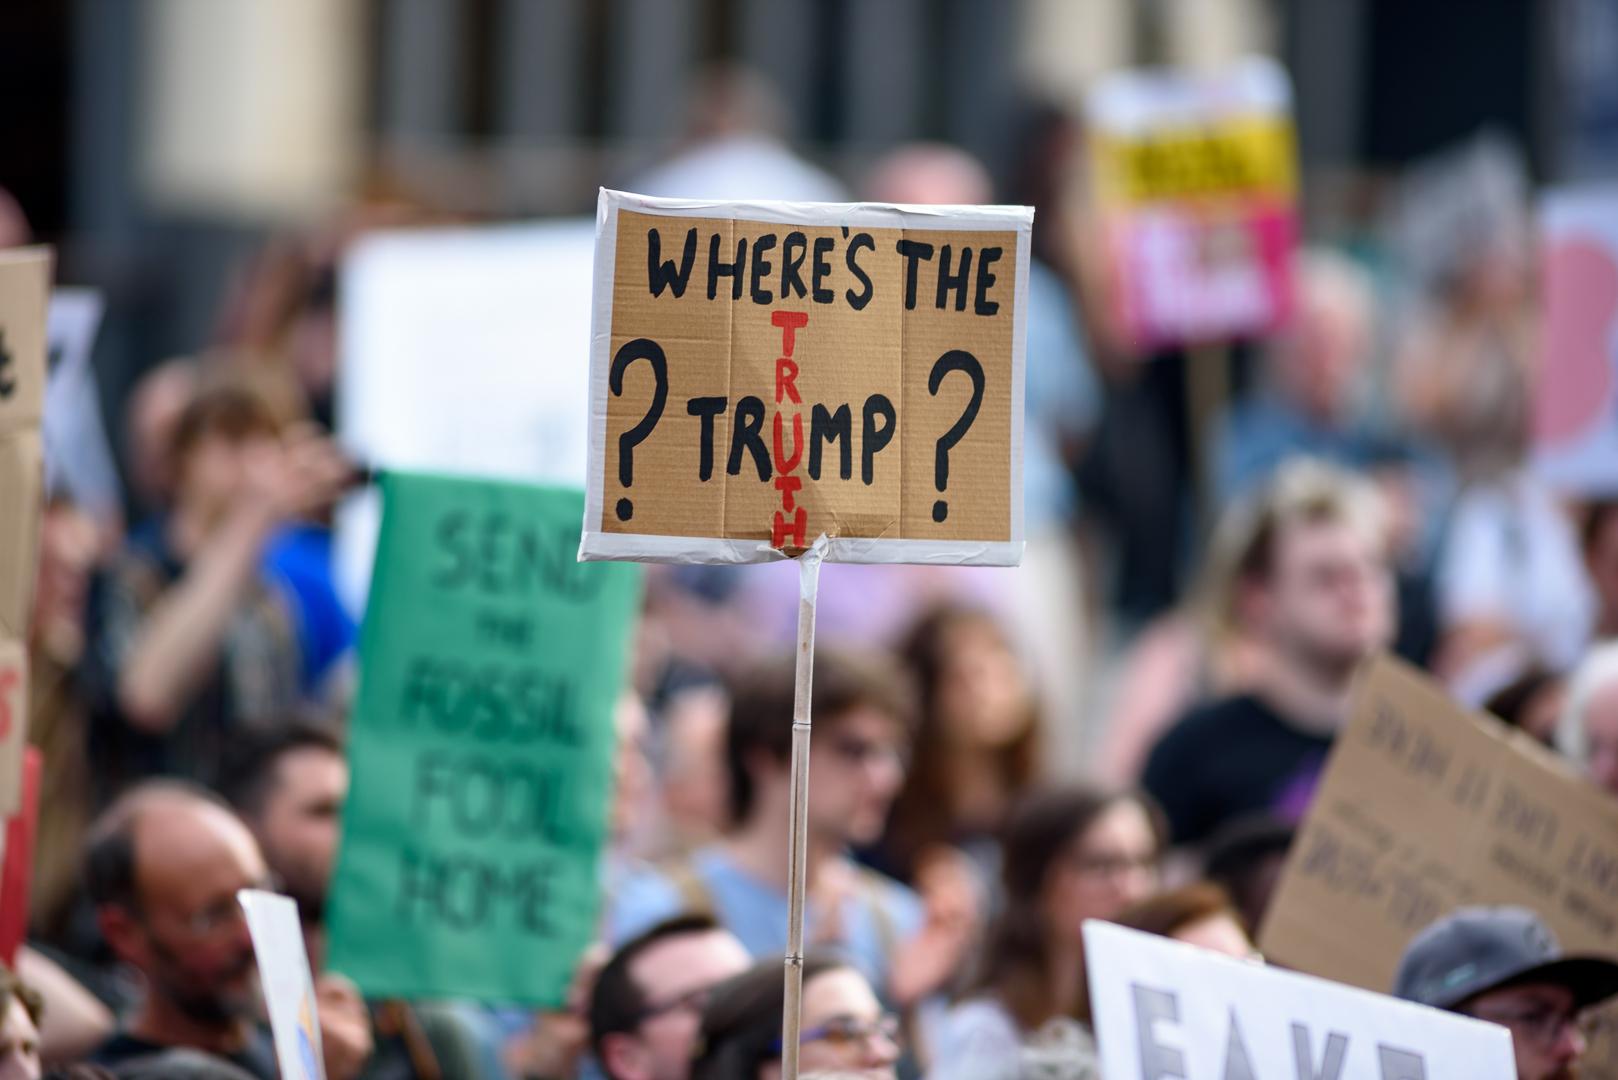 Sheffield Anti-Trump rally July 2018 Blog22.jpg